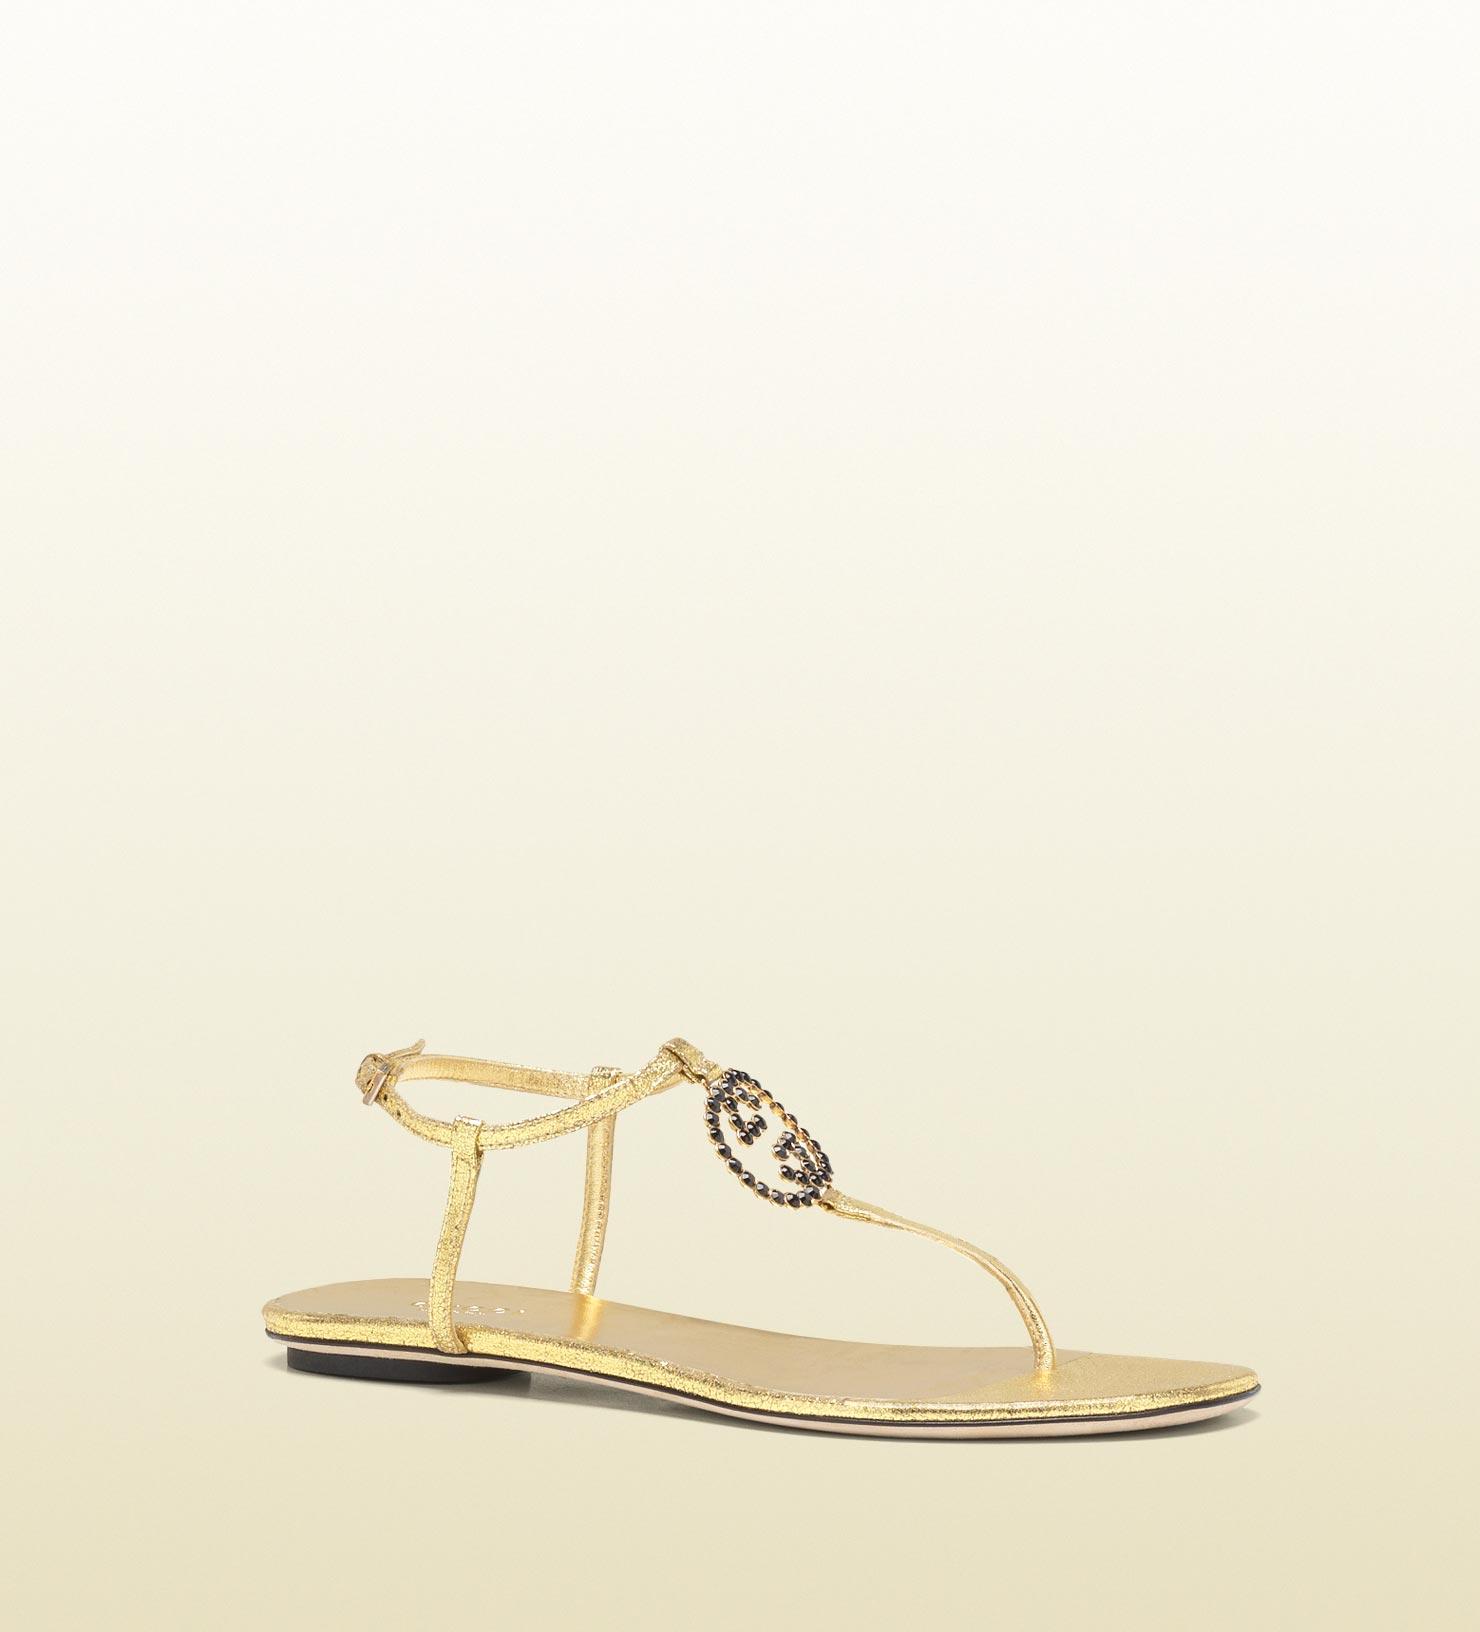 c4b9b36afeee Lyst - Gucci Katlin Jeweled Interlocking G Flat Thong Sandal in Metallic